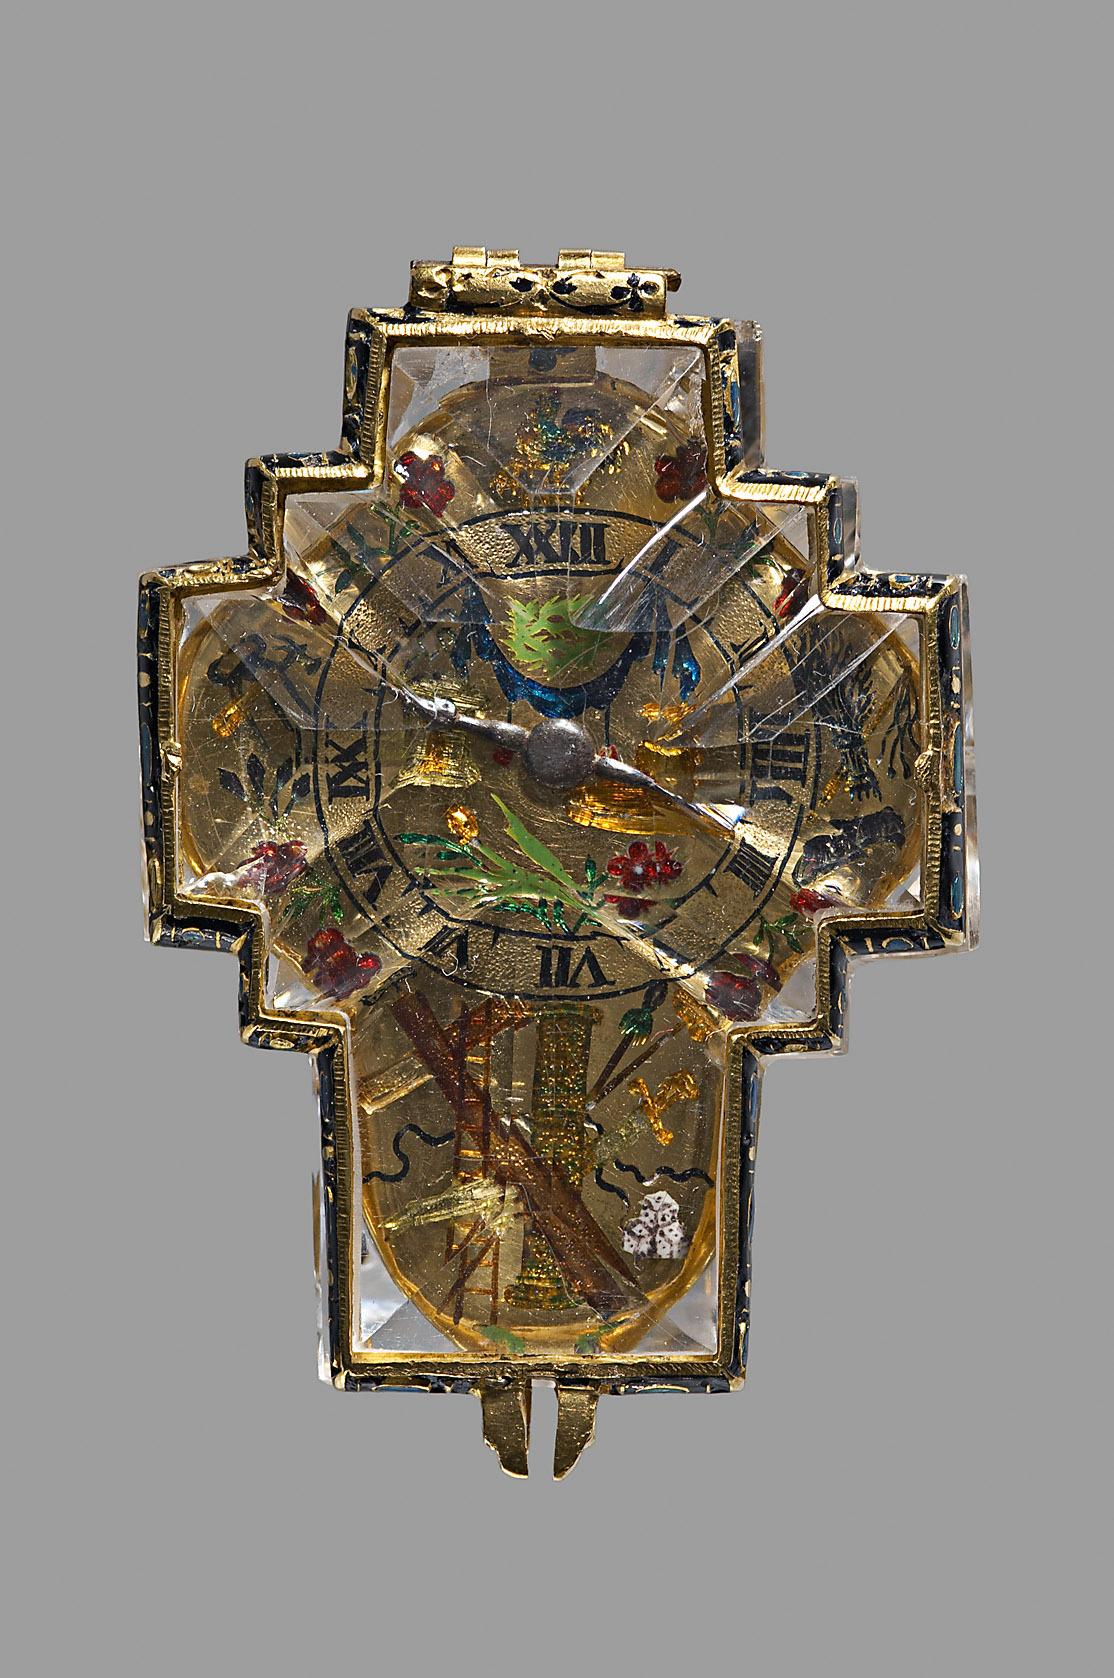 Kreuzförmige Halsuhr von Konrad Kreizer